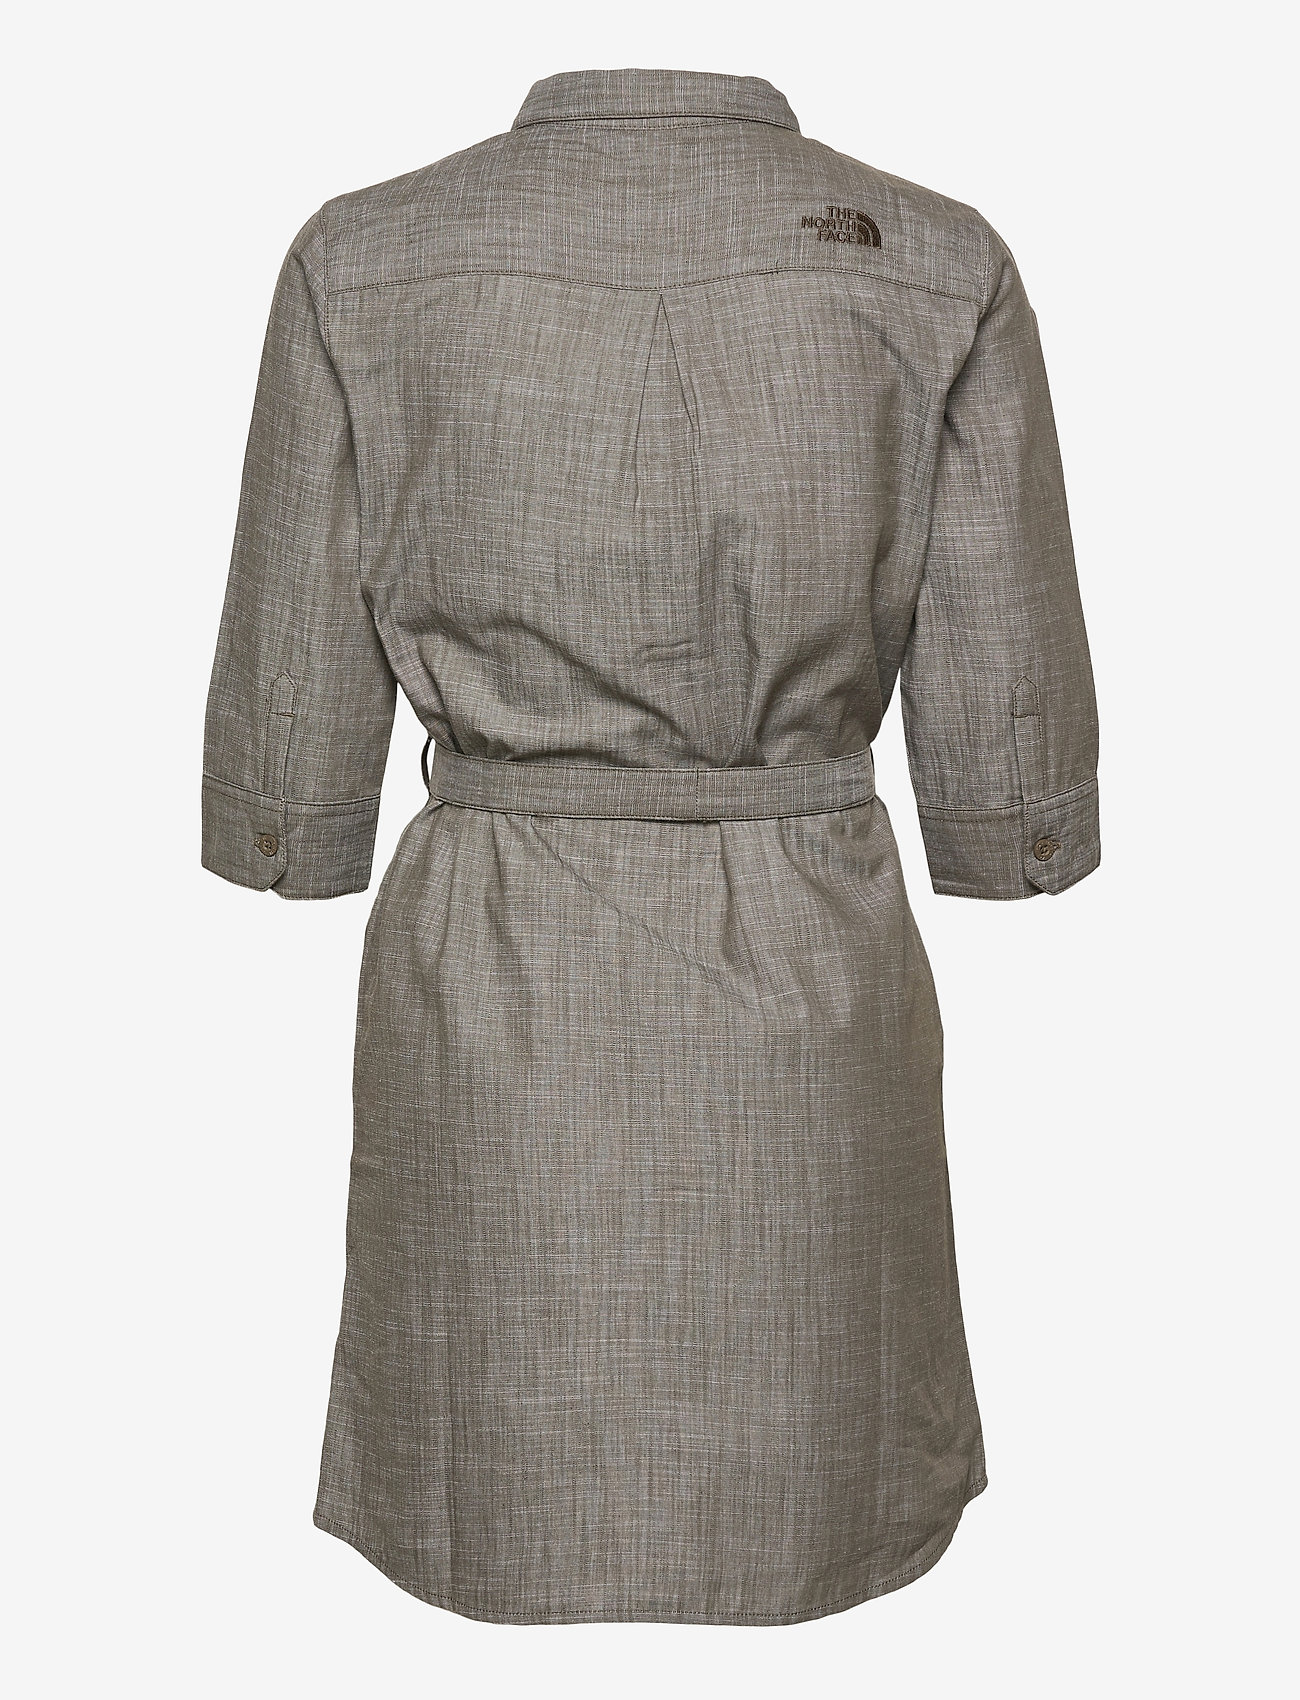 The North Face - W BERNINA DRESS - sommerkjoler - new taupe green chambray - 1